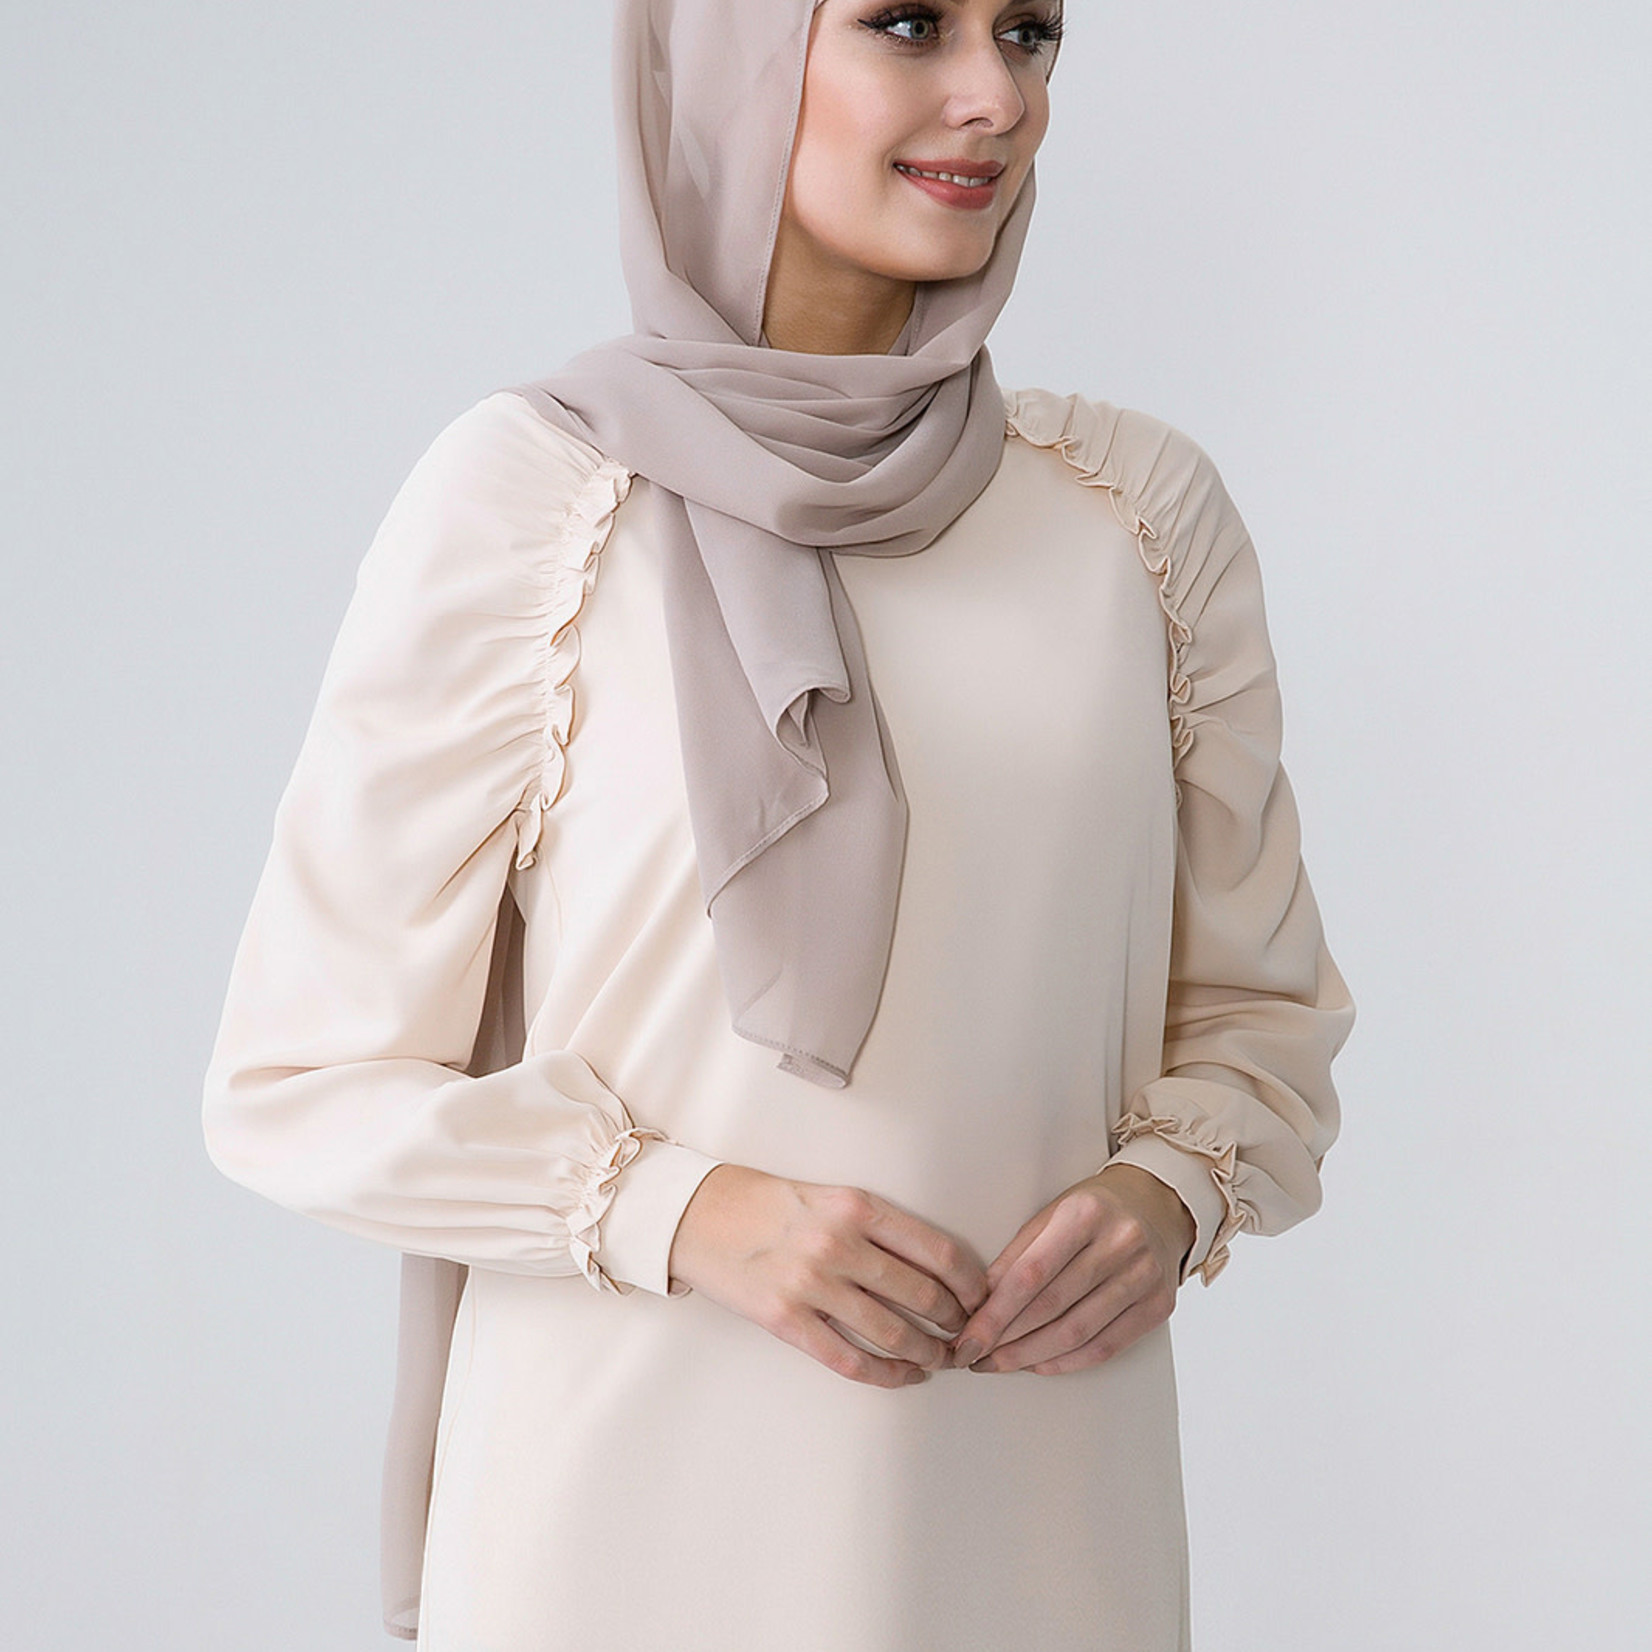 Hijab House Elva Blouse